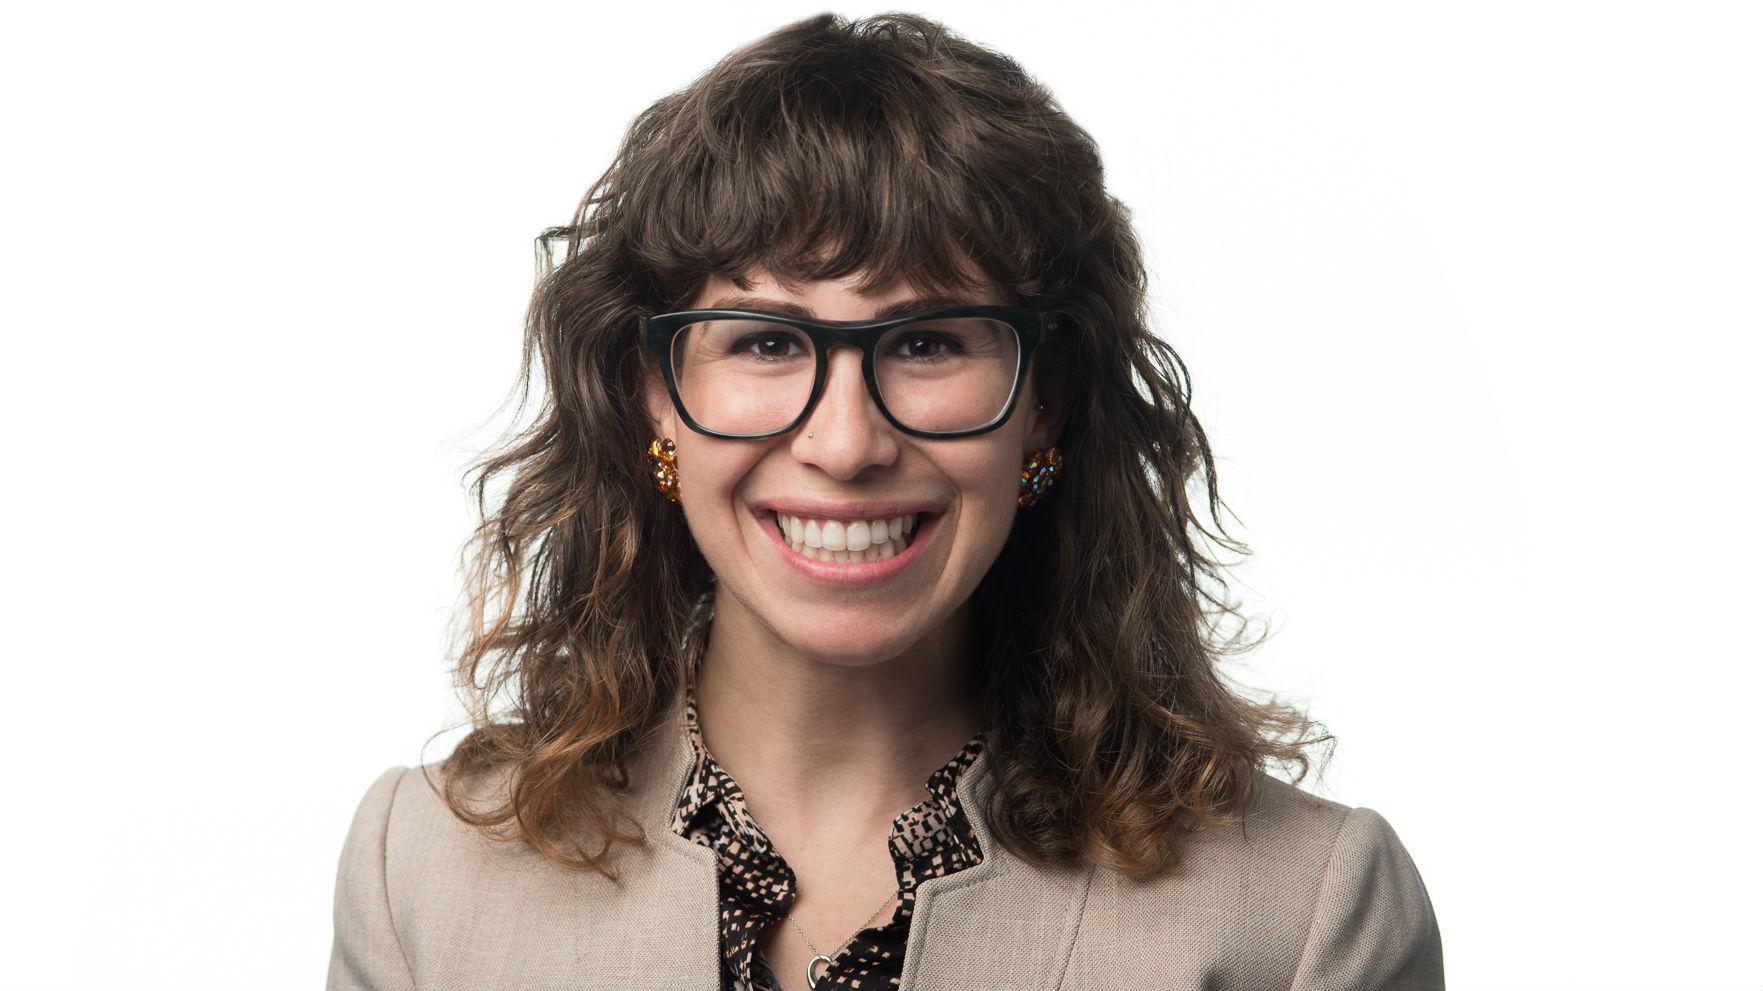 HRC HIV 360 Fellow Nicole Elinoff